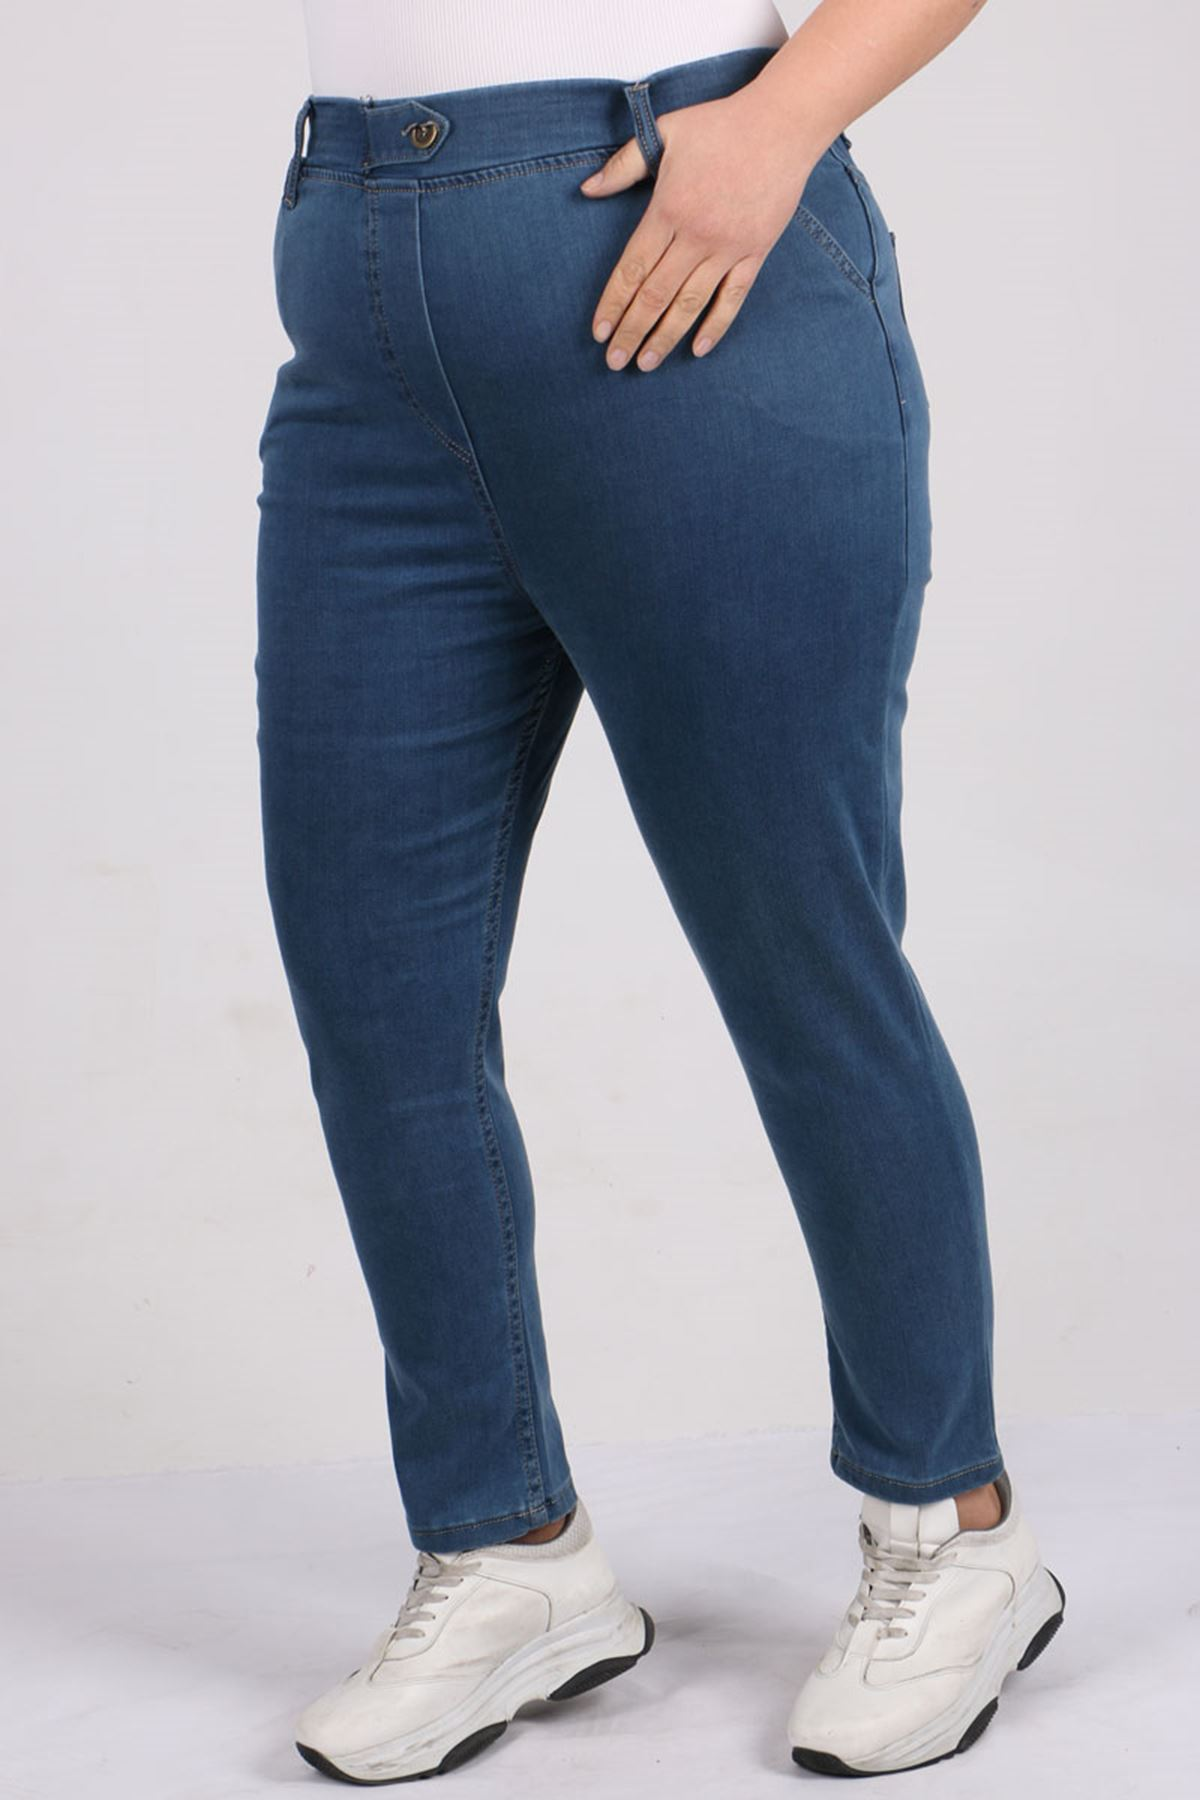 9144 Plus Size Elastic Waist Skinny Leg Jeans - Blue